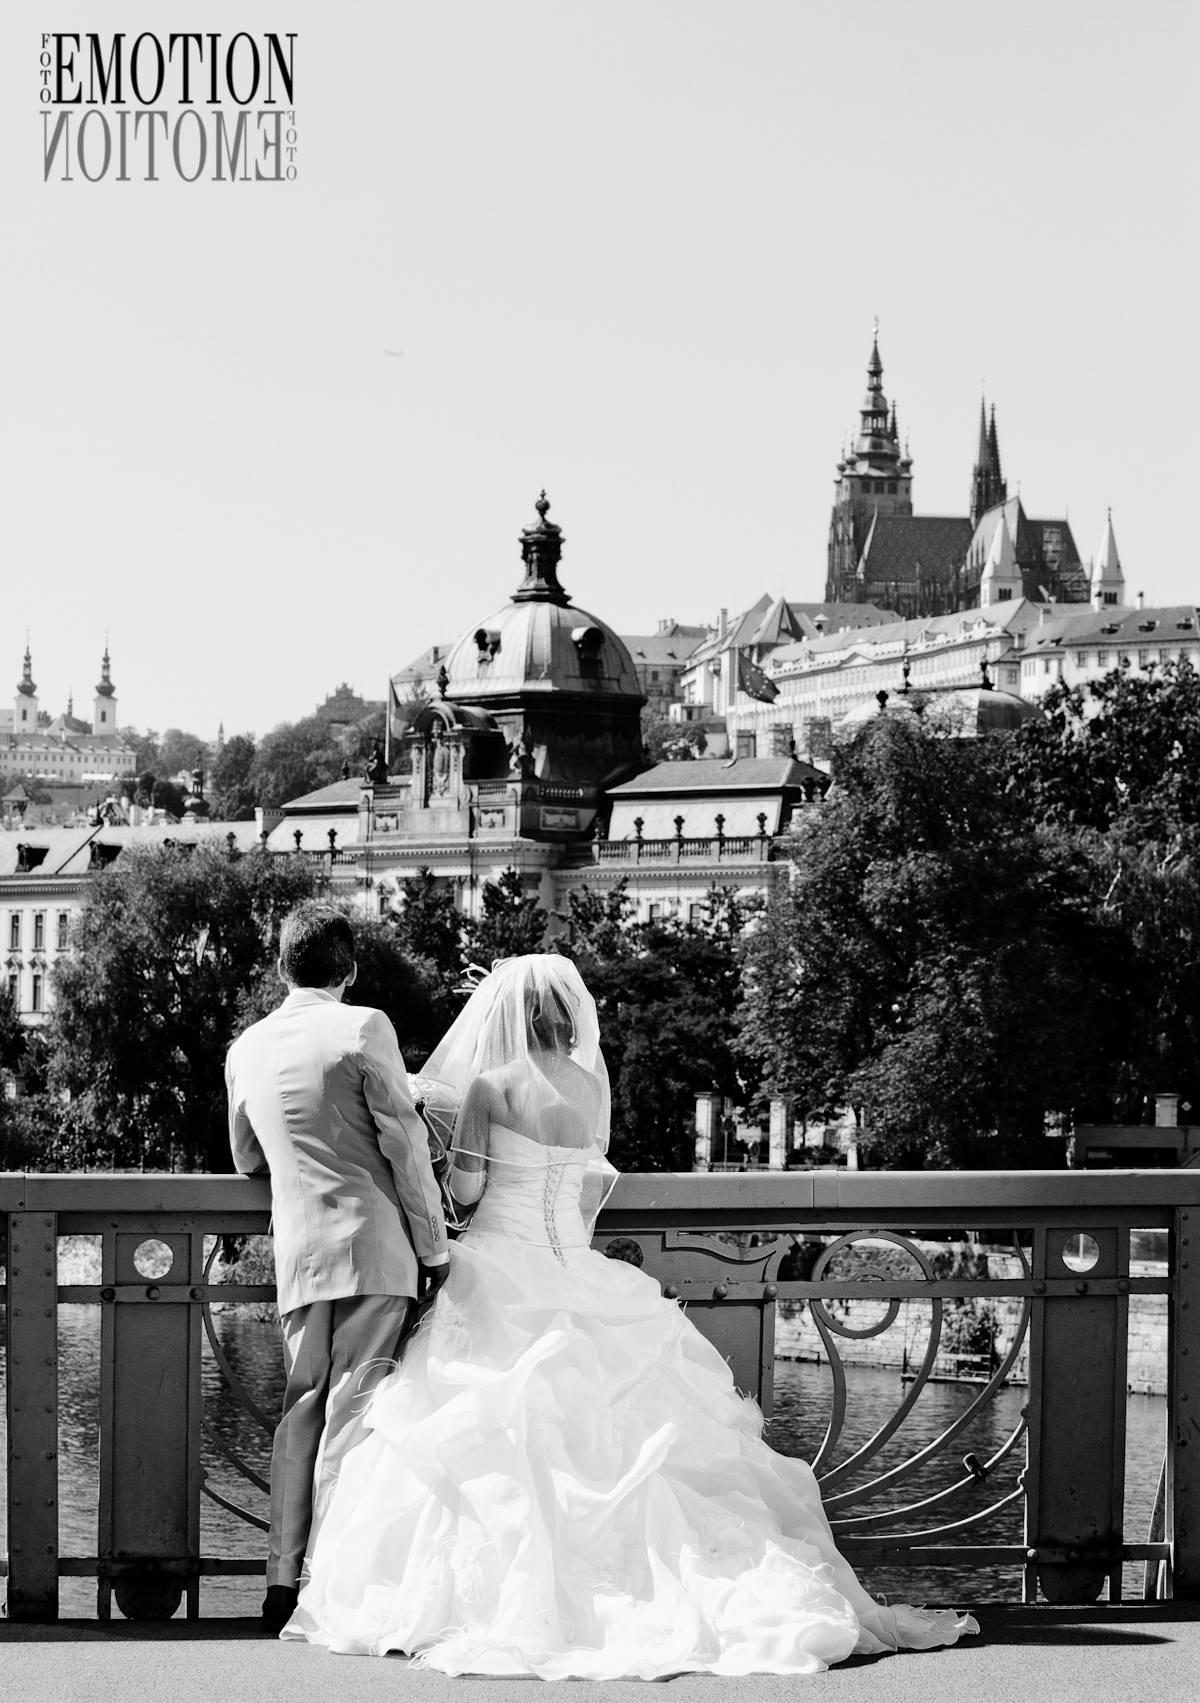 Svatebni fotograf Praha - fotograf Martina Root Praha